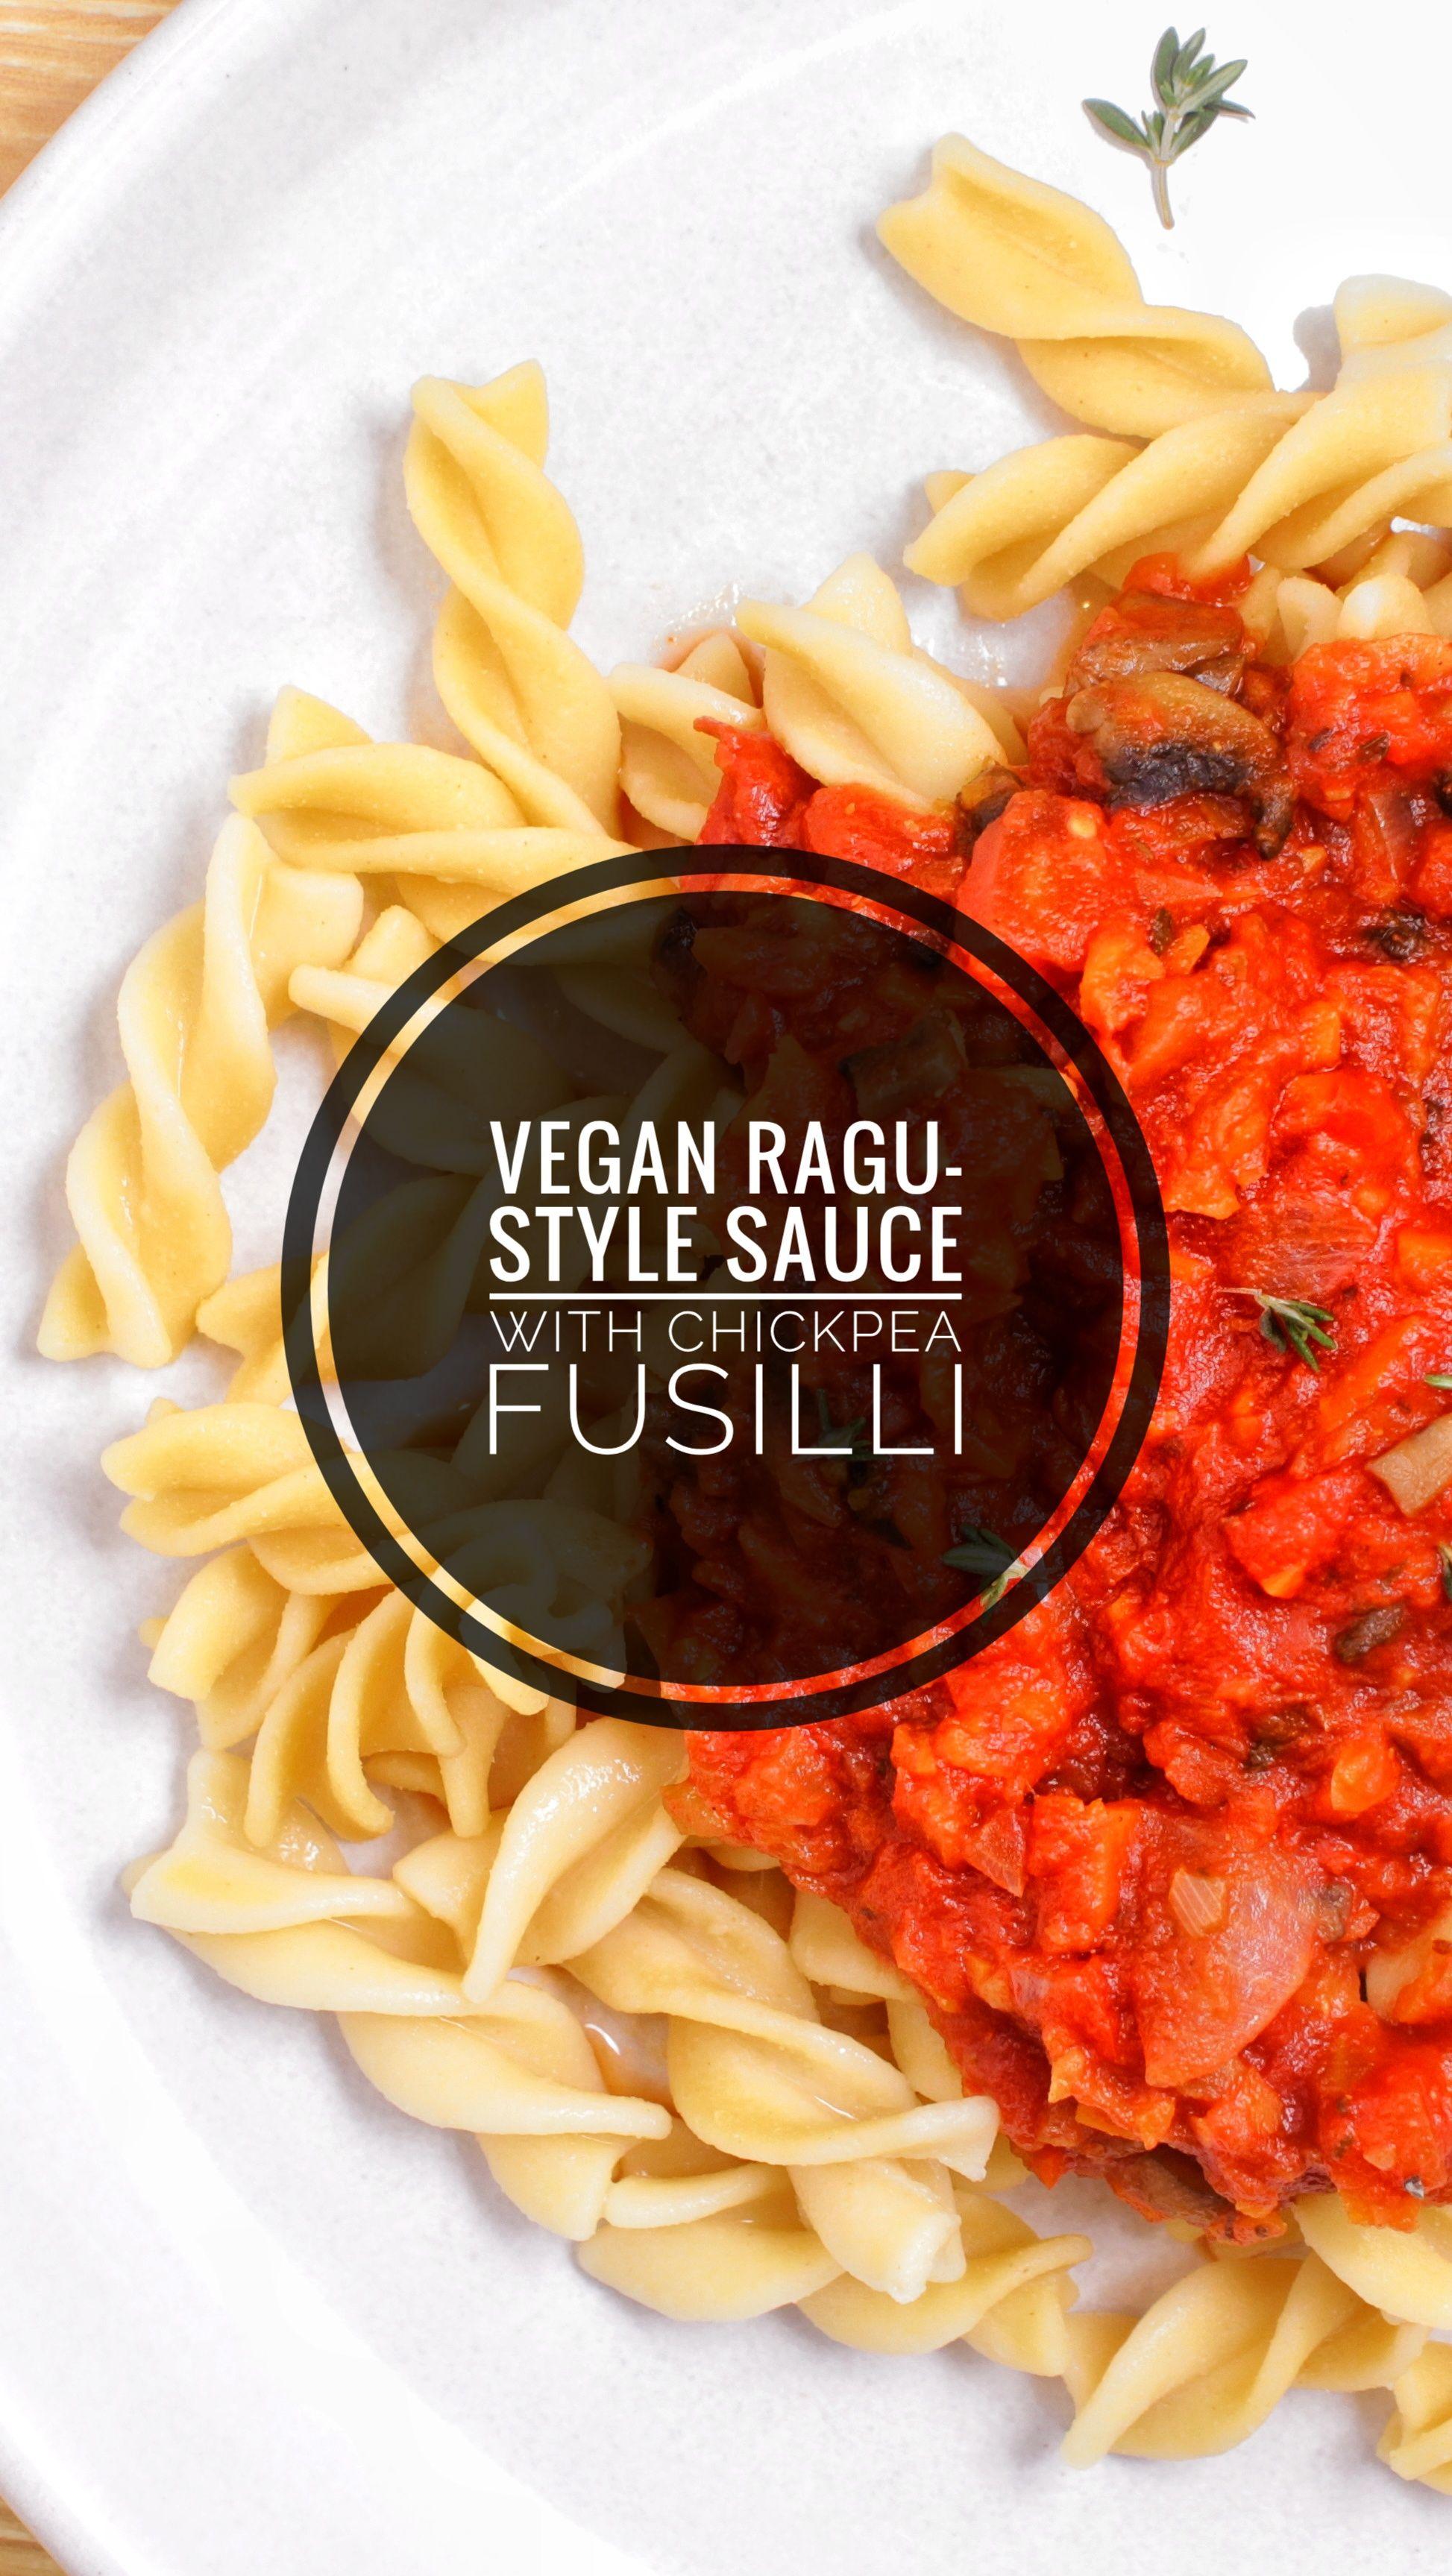 Vegan Ragu-Style Sauce & Chickpea Fusilli | Fusilli, Food ...